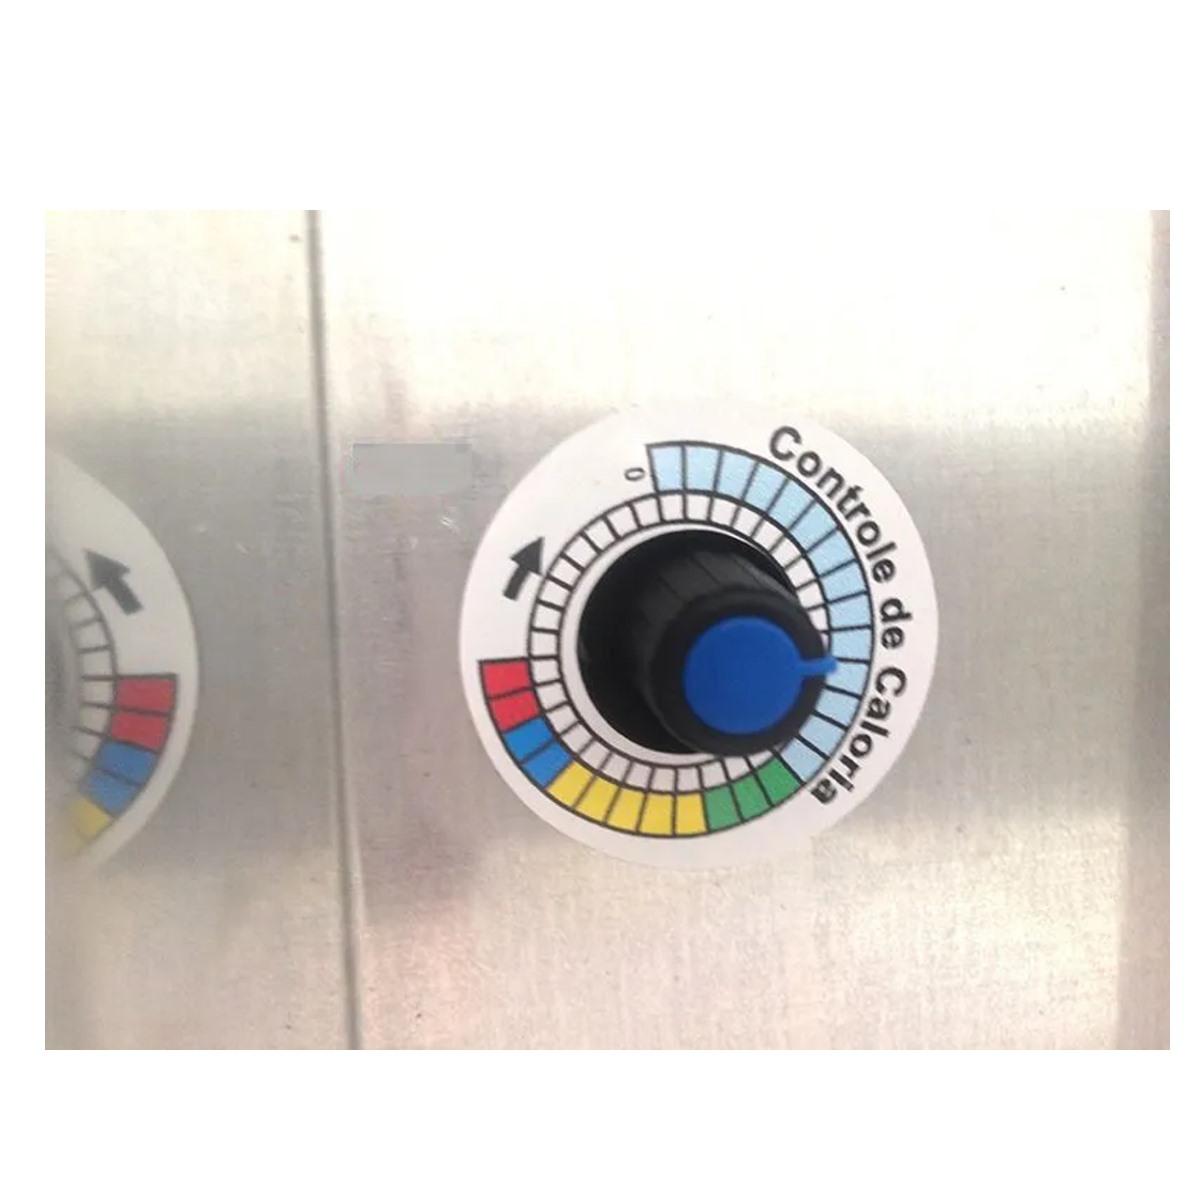 Plastificadora Profissional para Crachá CPF Tìtulo RG P180